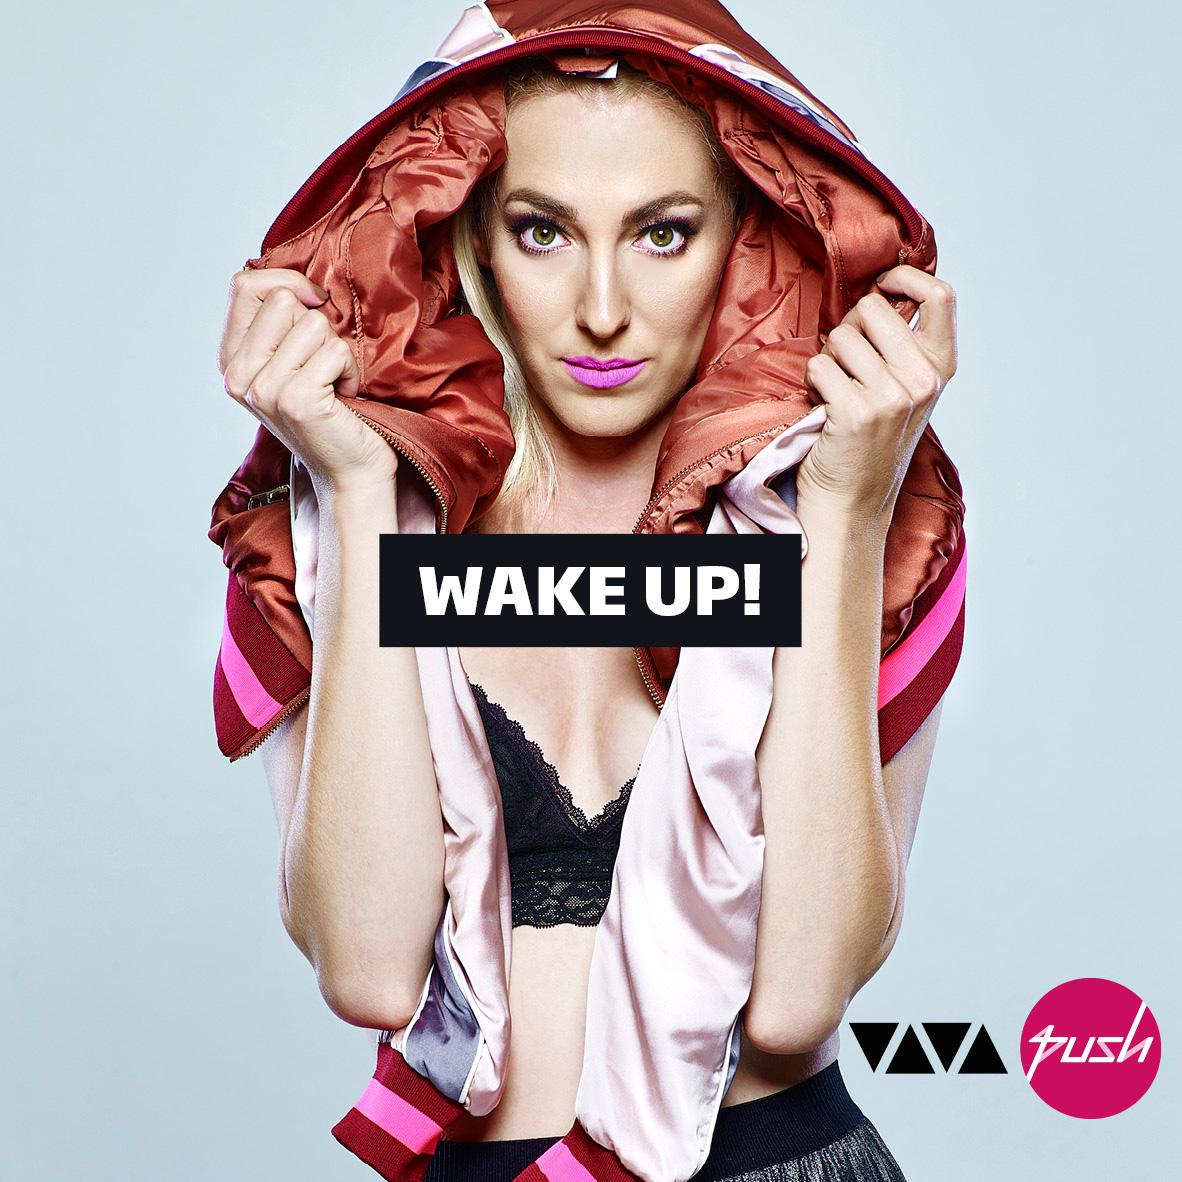 viva_push_youli.jpg